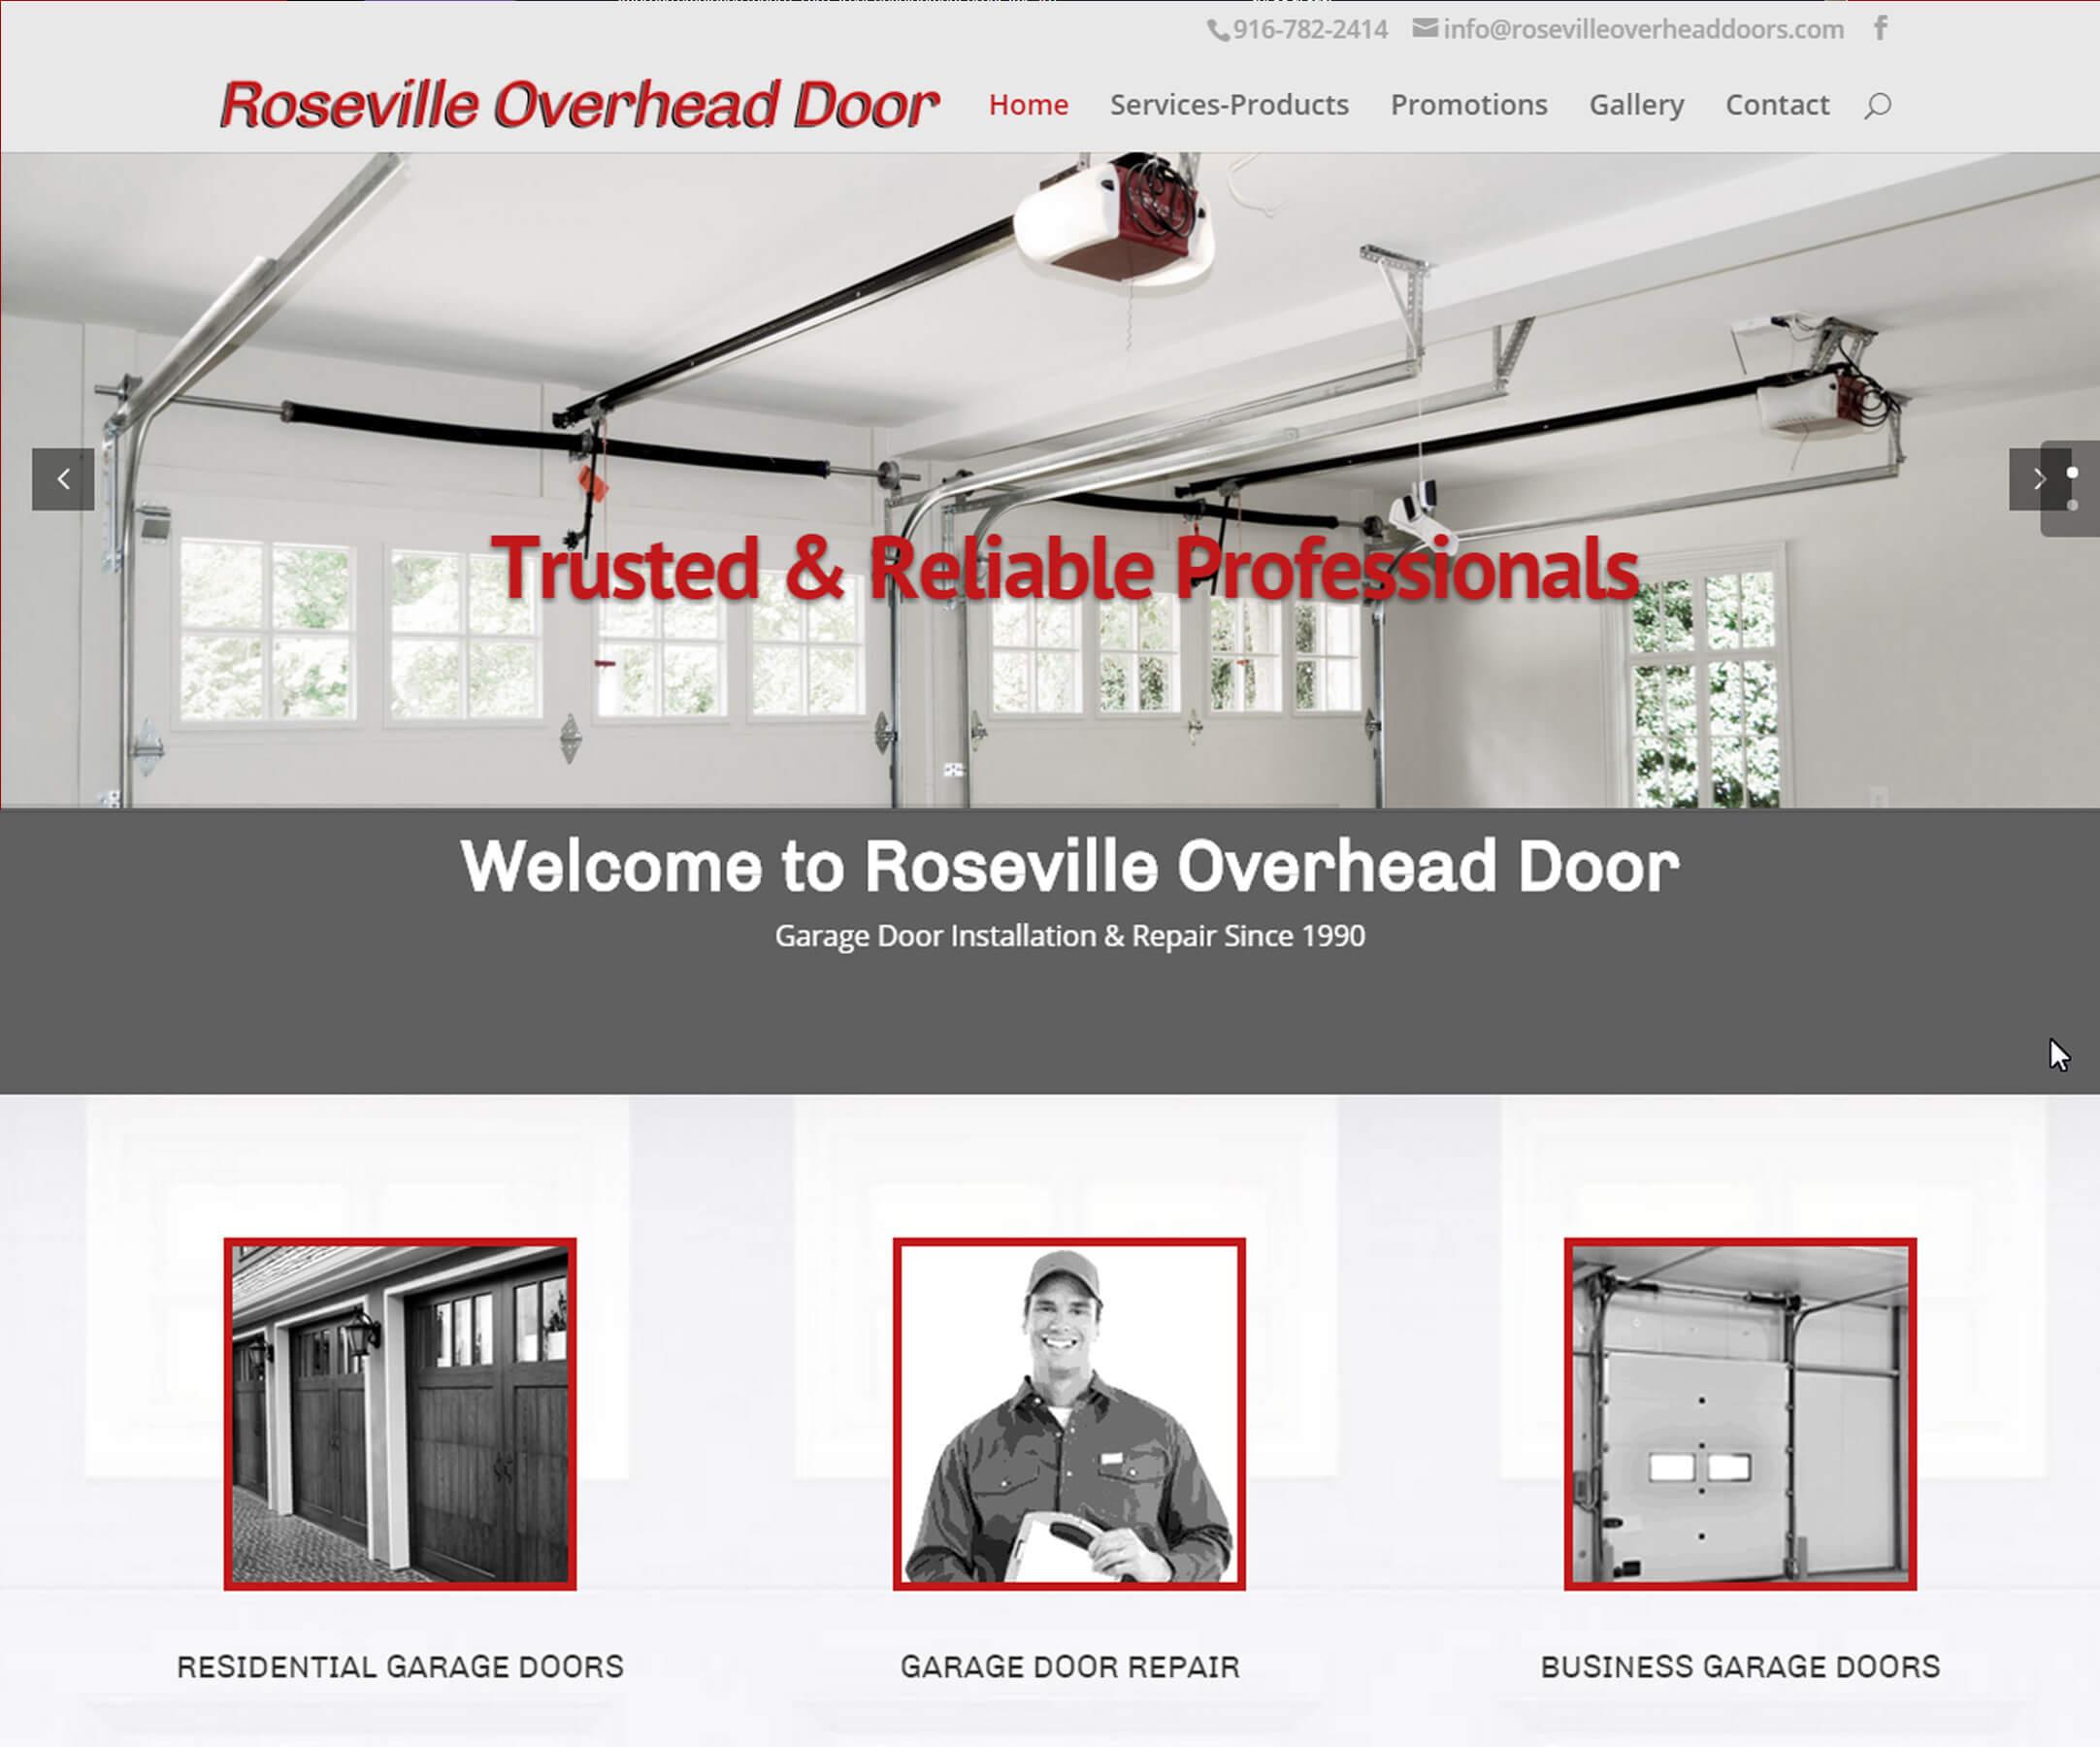 Roseville Overhead Doors website design by FossMG 02-2015